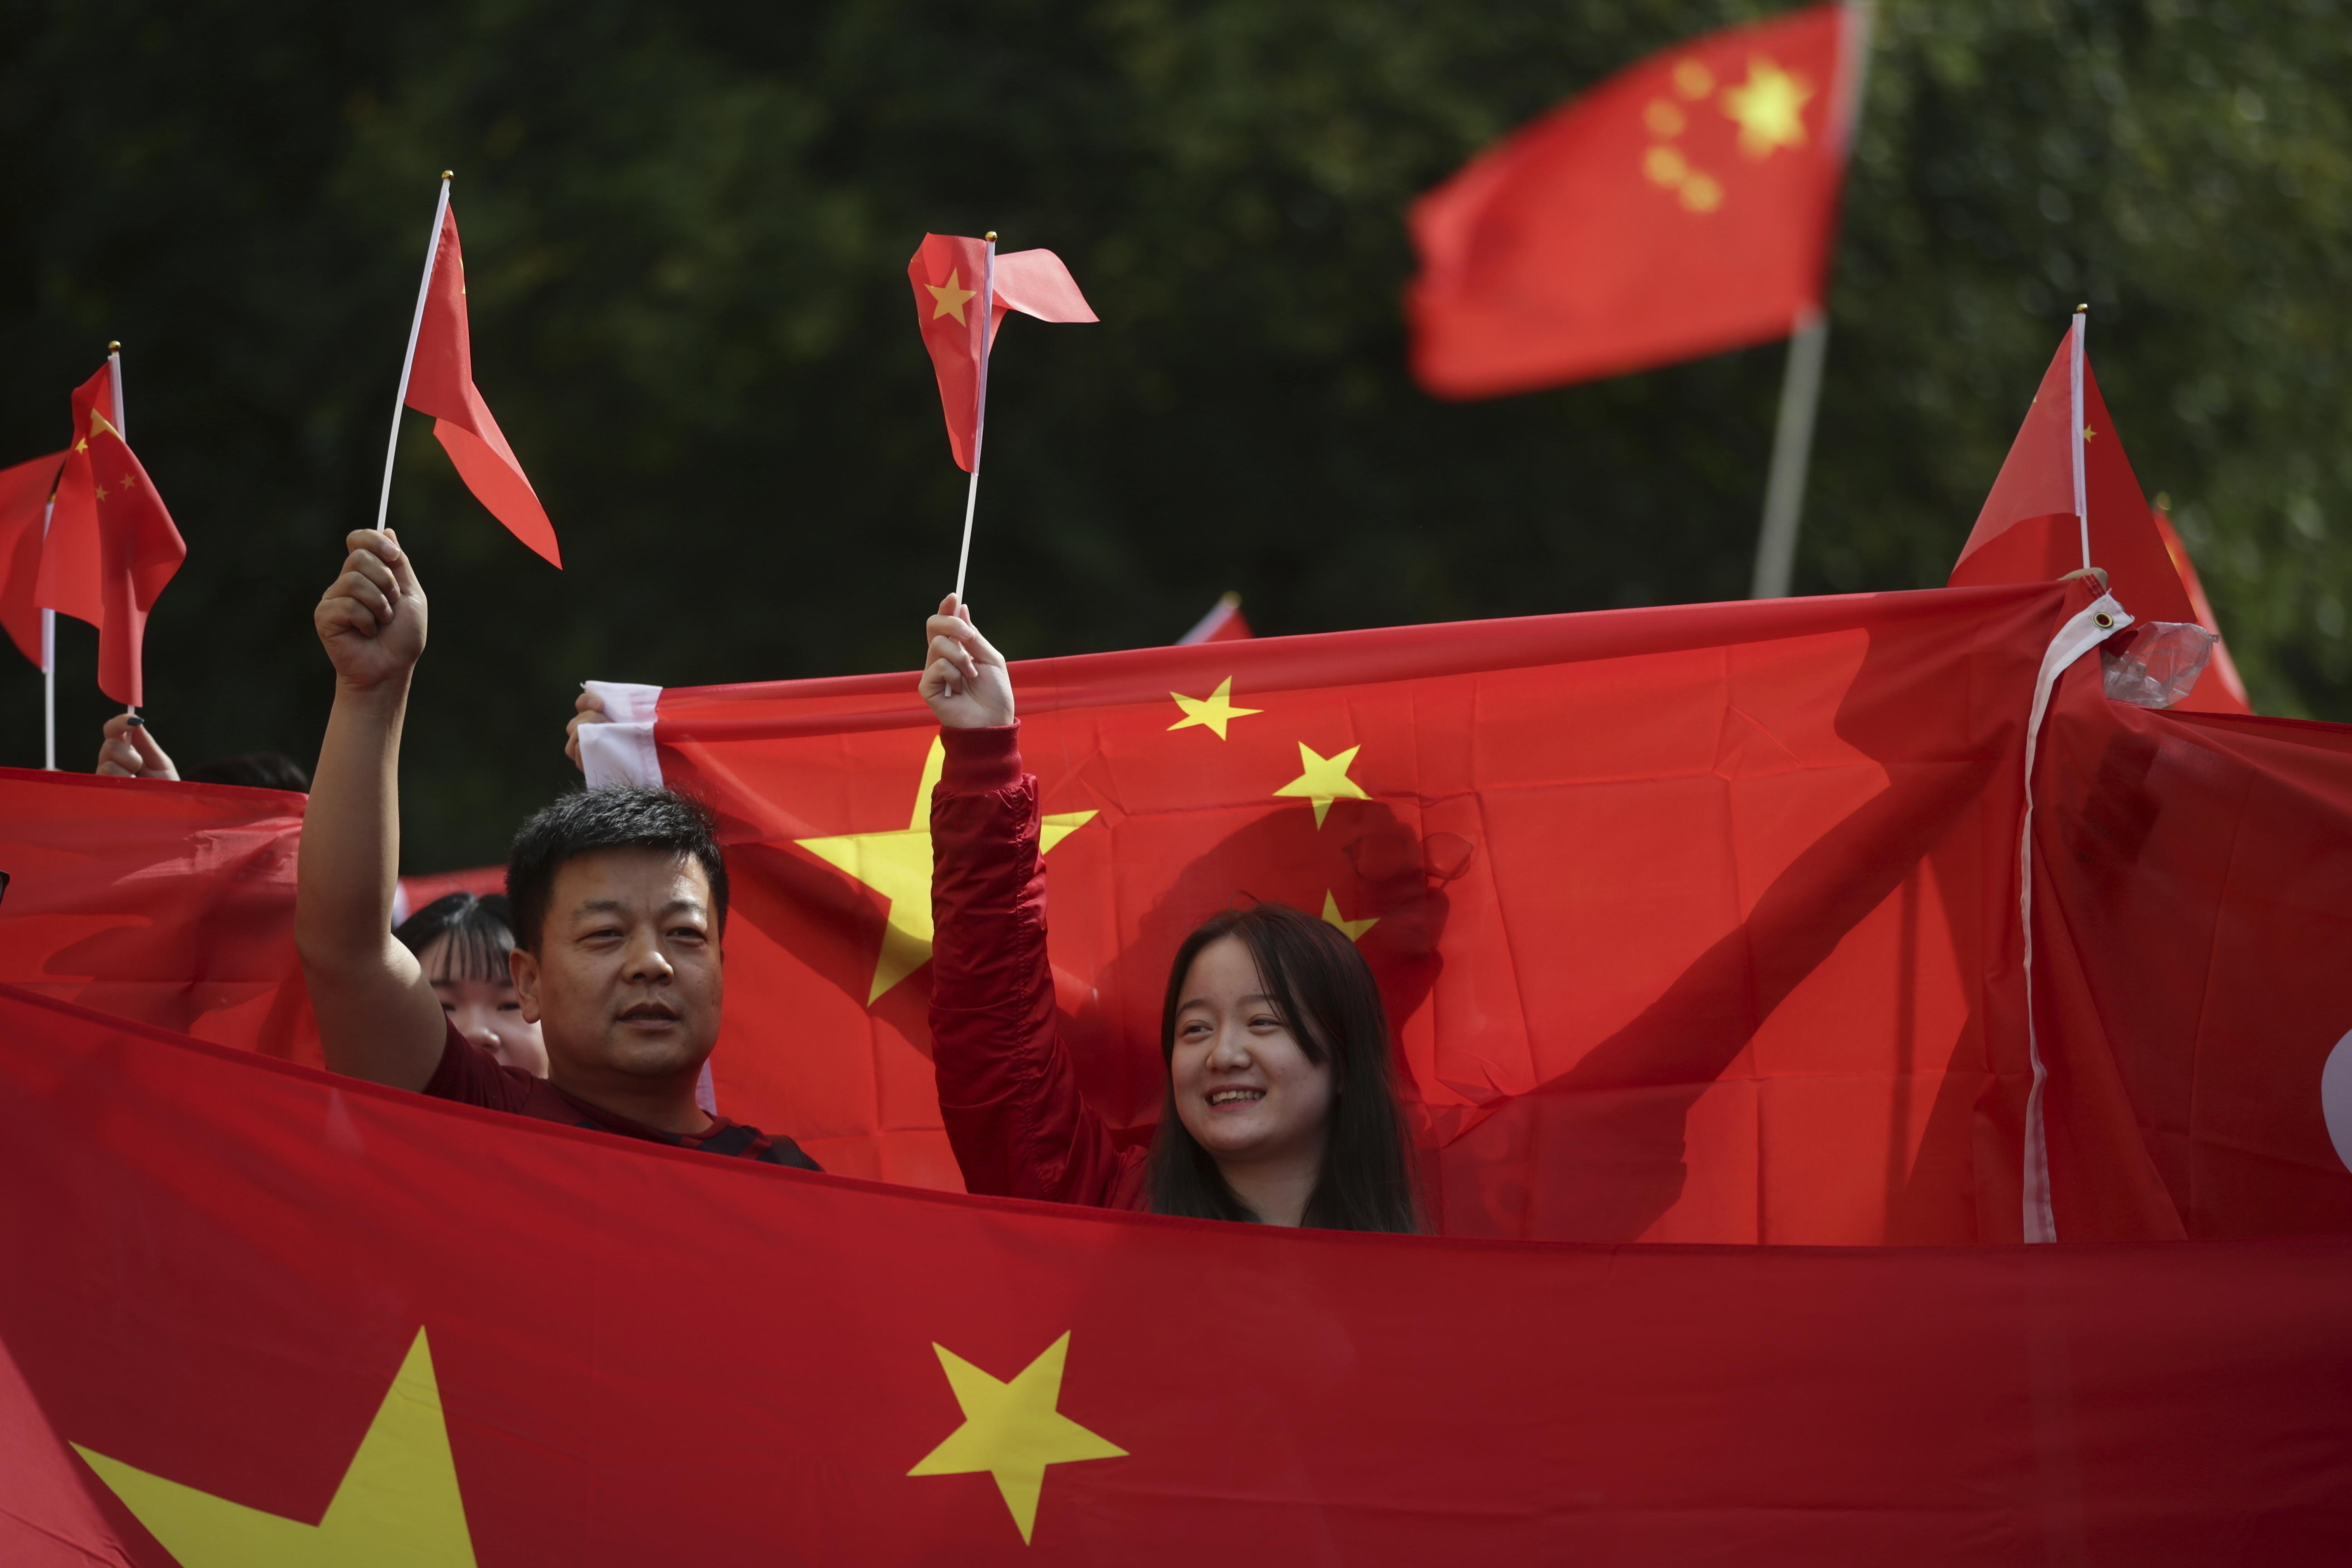 China's secret propaganda rules revealed